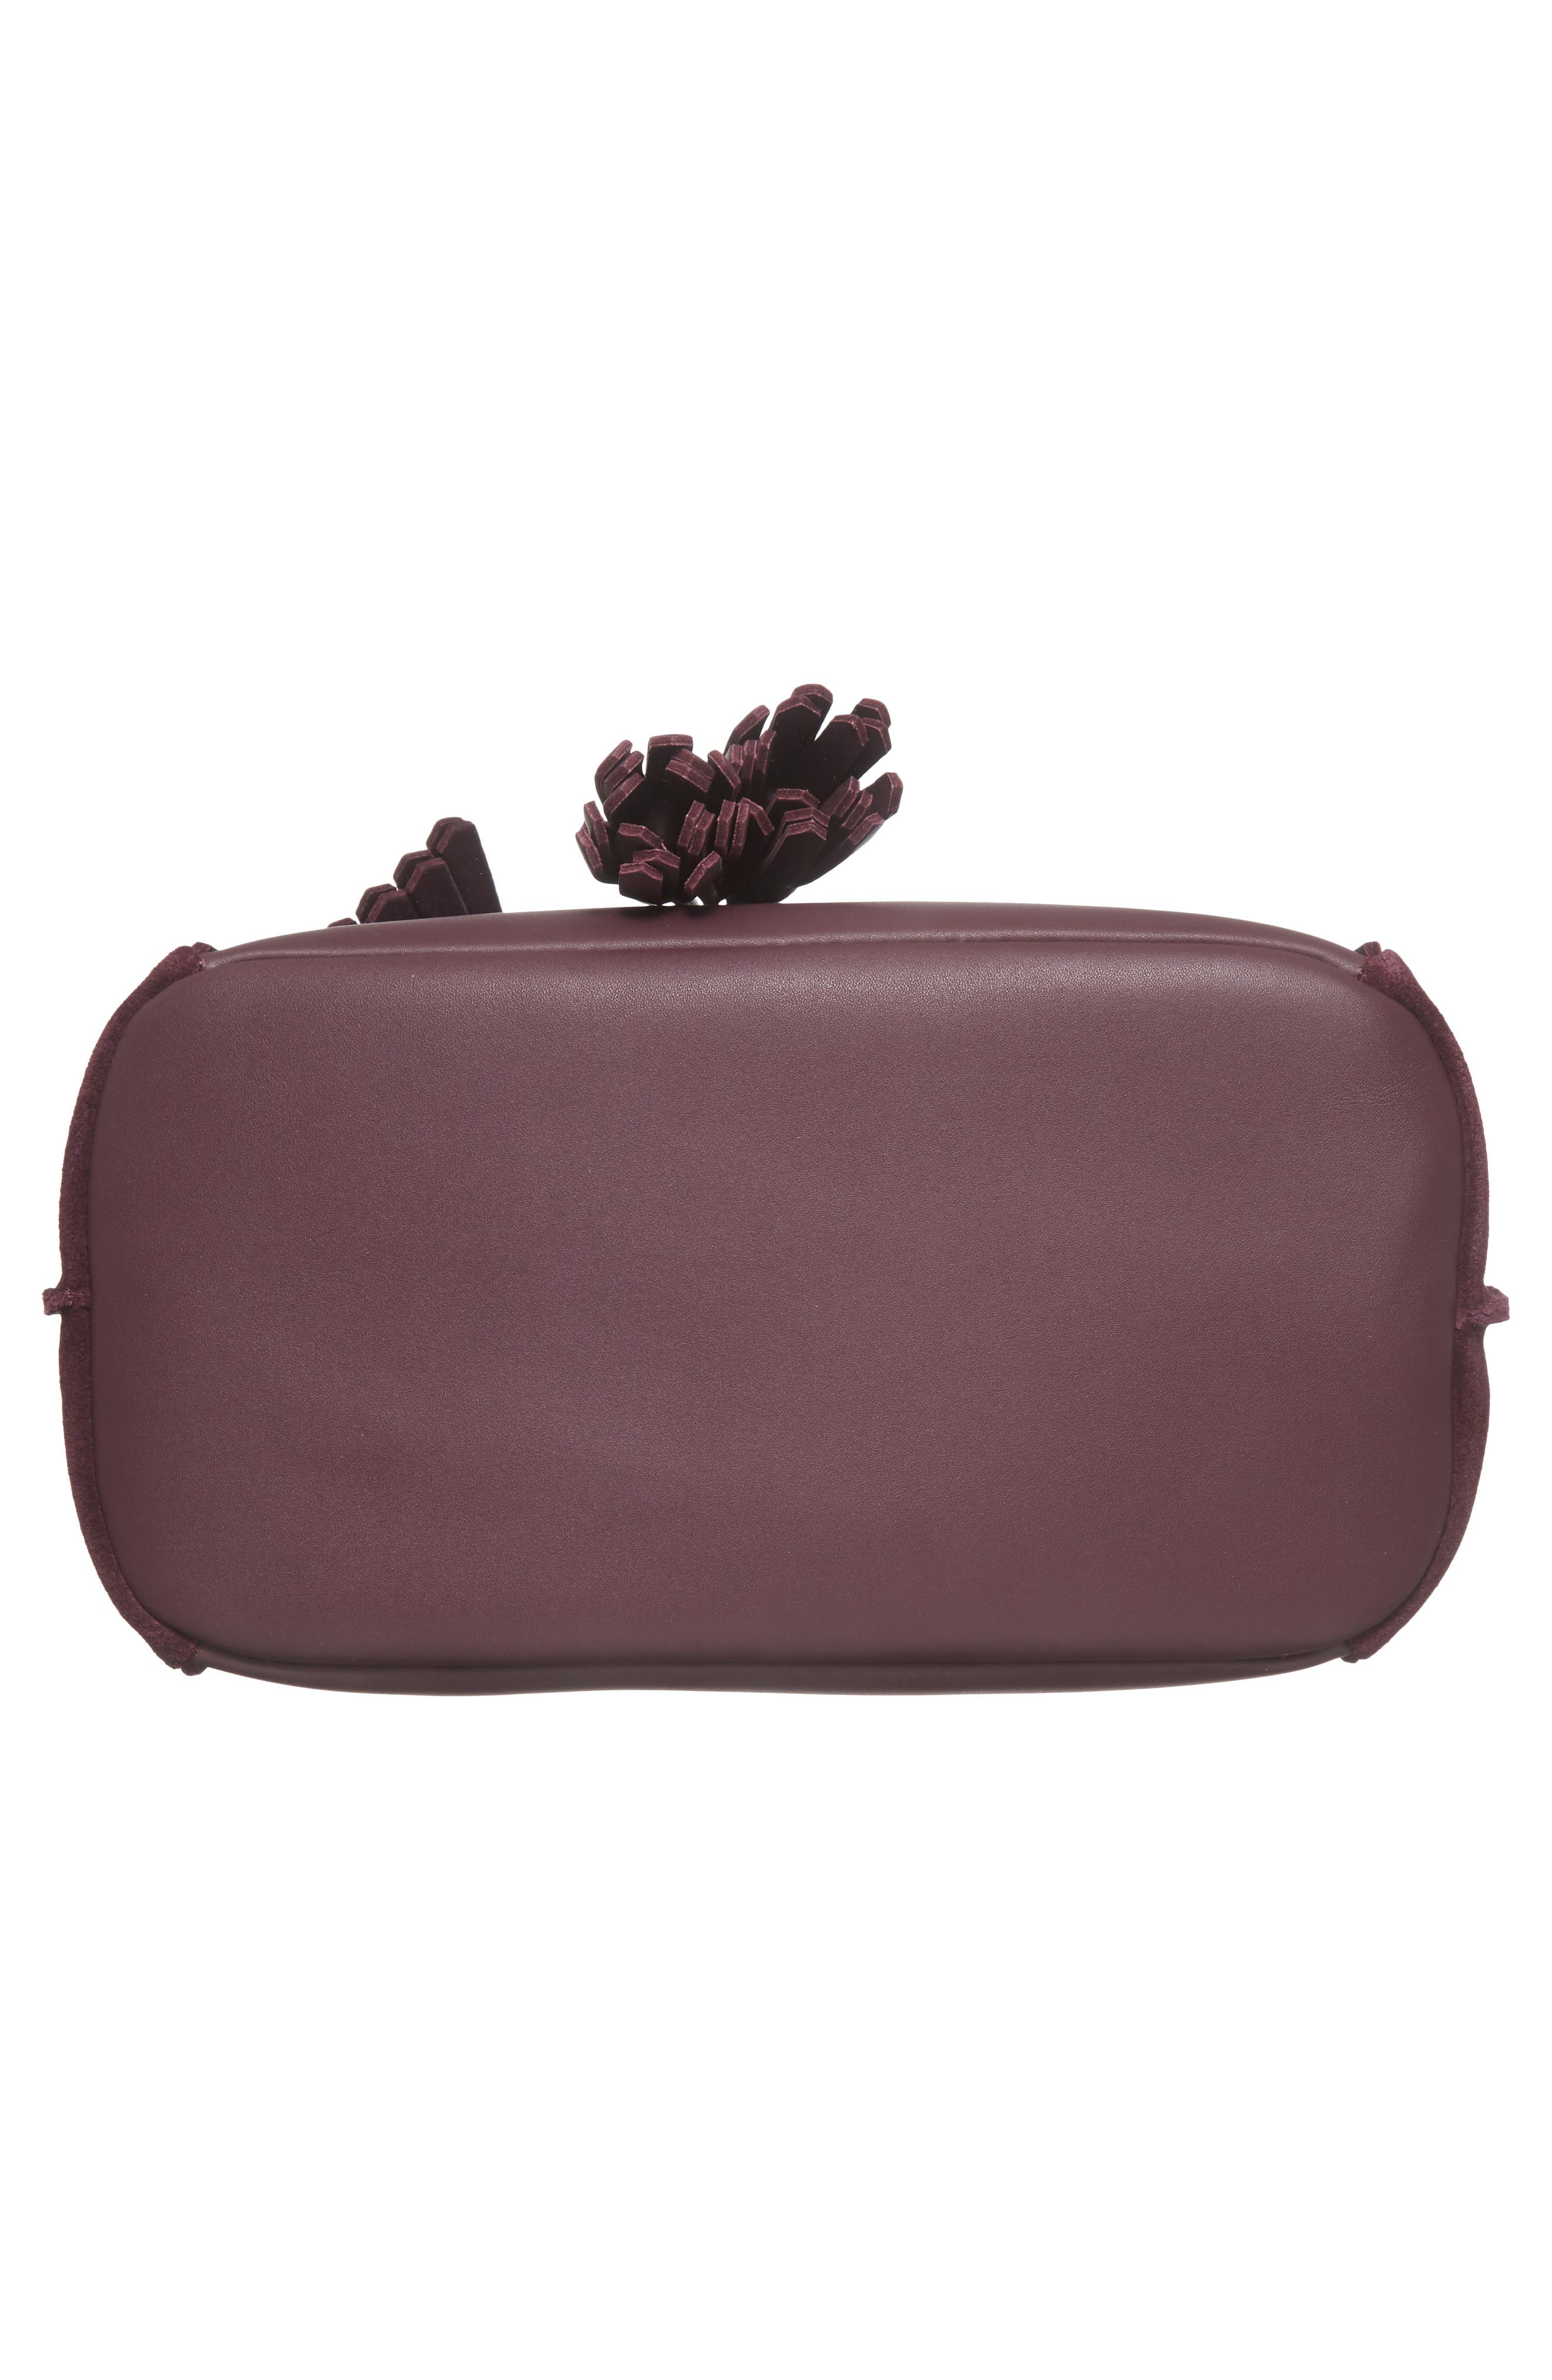 Penelope Fantasie Leather Bucket Bag,                             Alternate thumbnail 16, color,